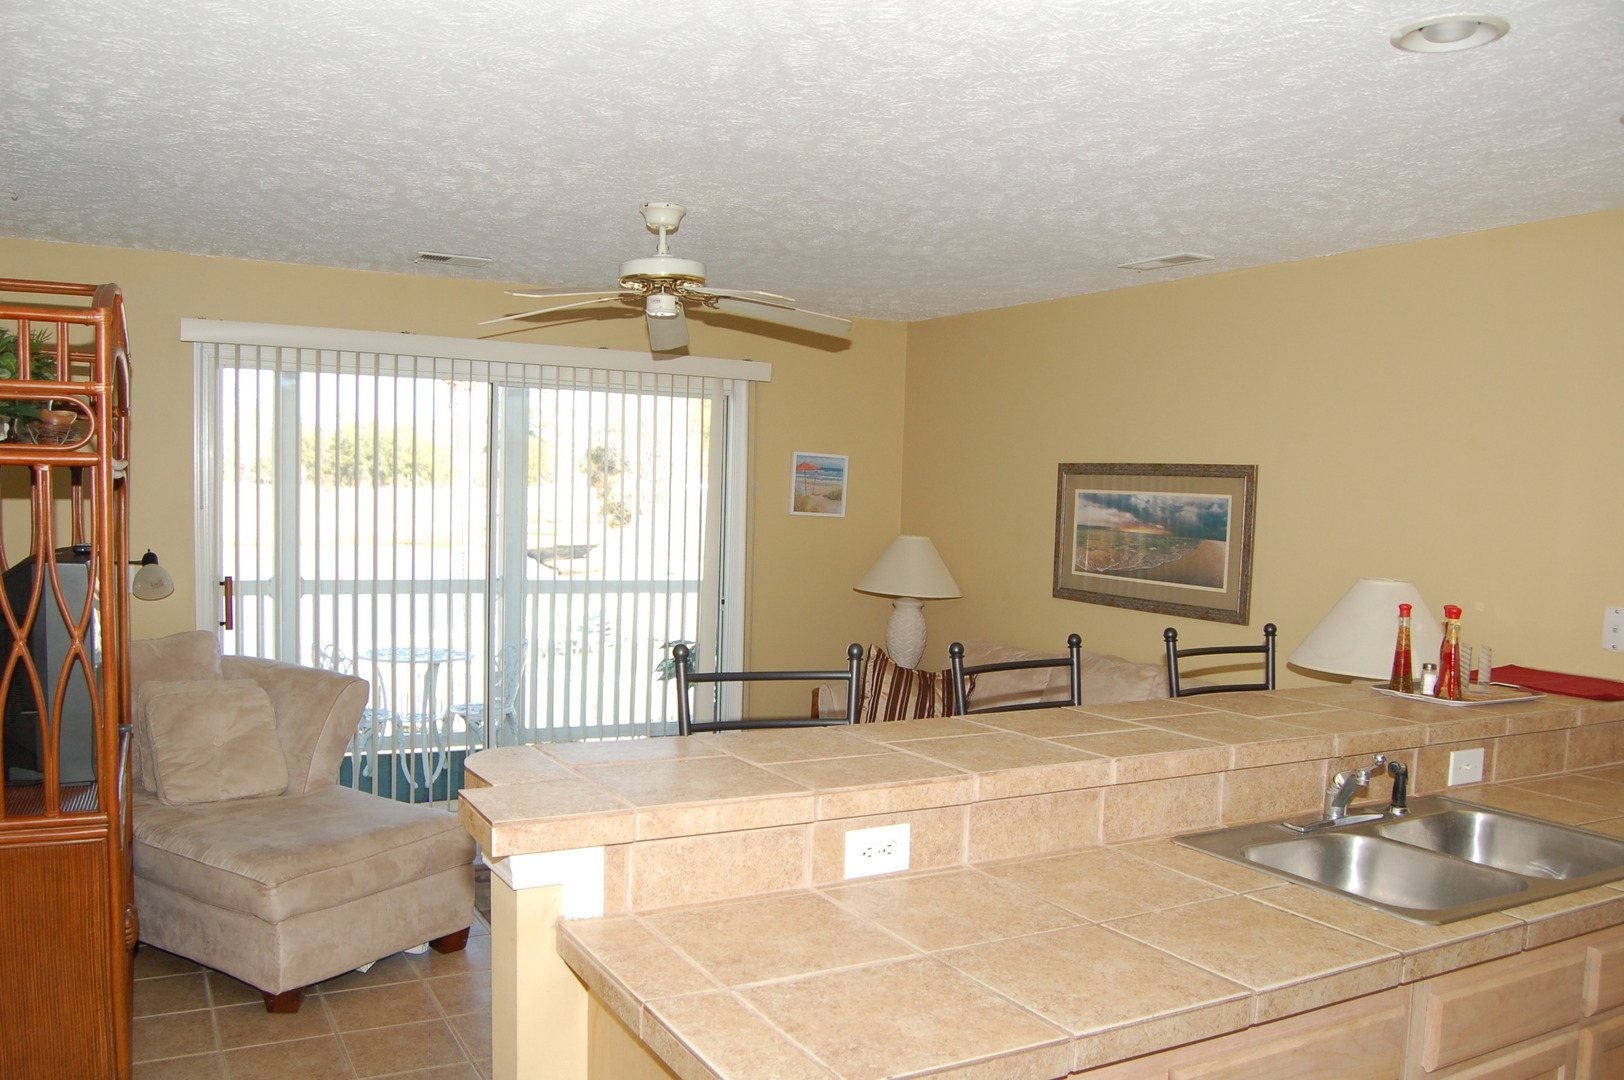 2nd Floor Furnished 1 Bedroom Condo In River Oaks